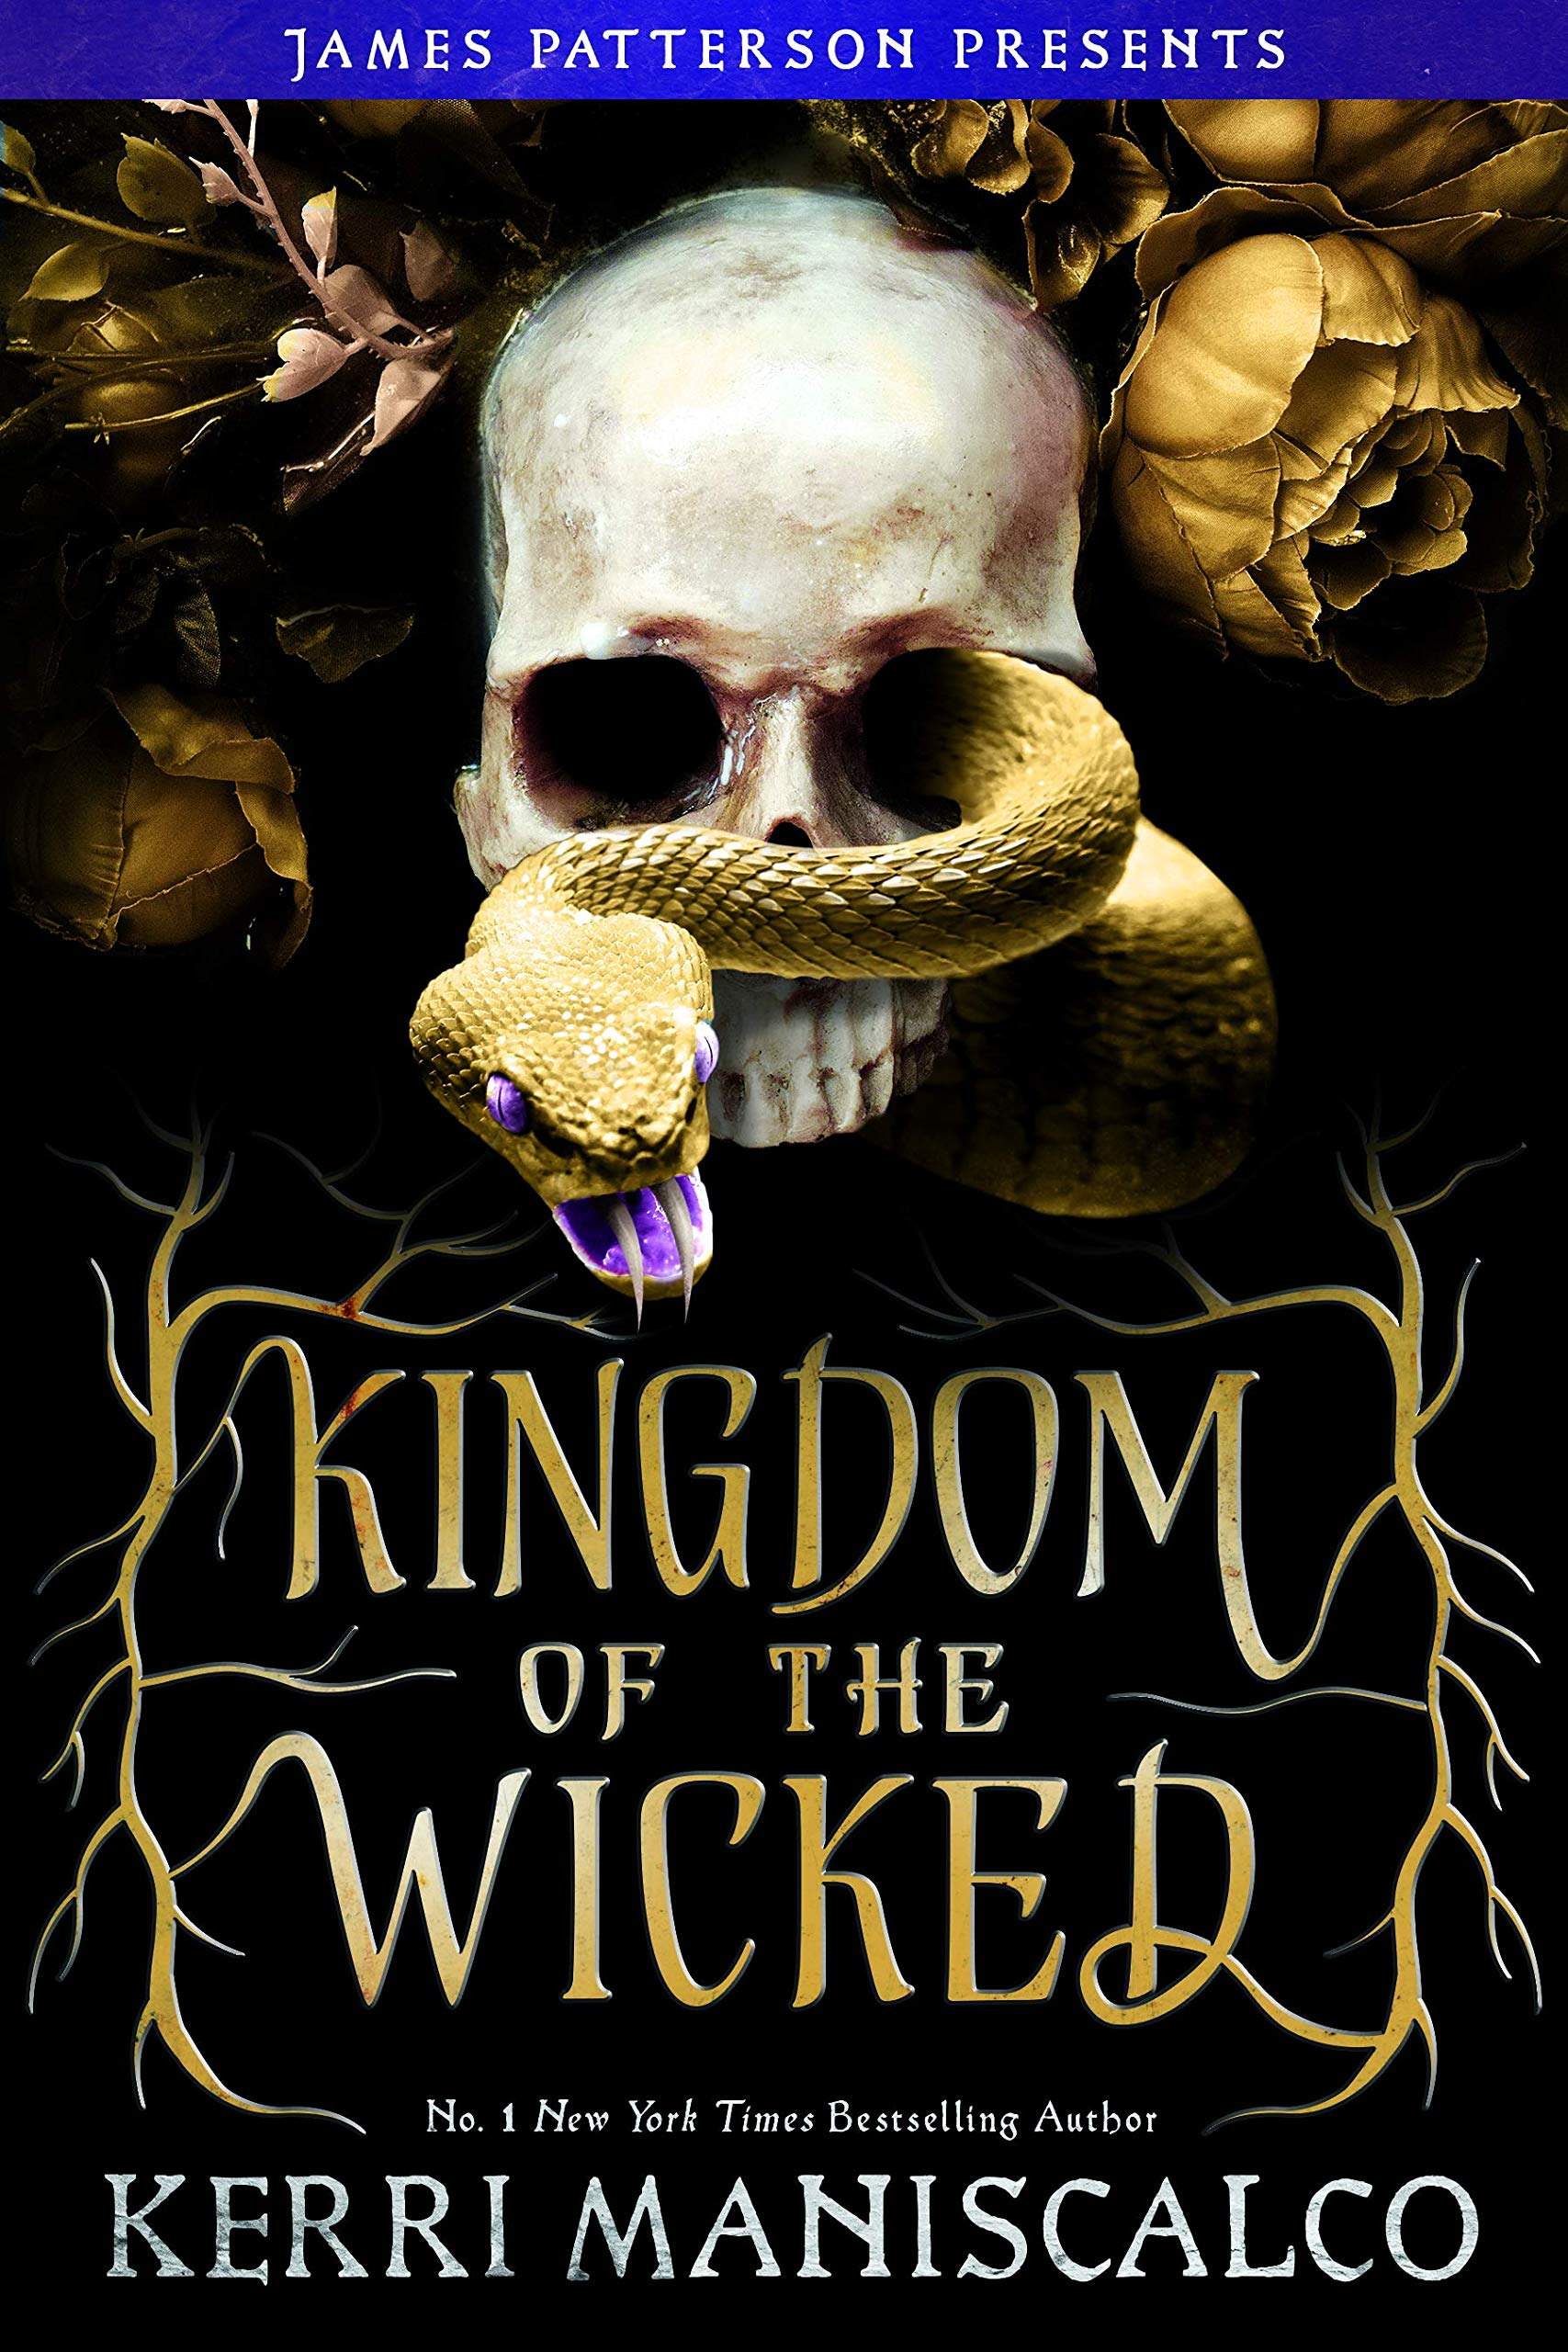 Amazon.com: Kingdom of the Wicked (Kingdom of the Wicked, 1)  (9780316428460): Maniscalco, Kerri: Books